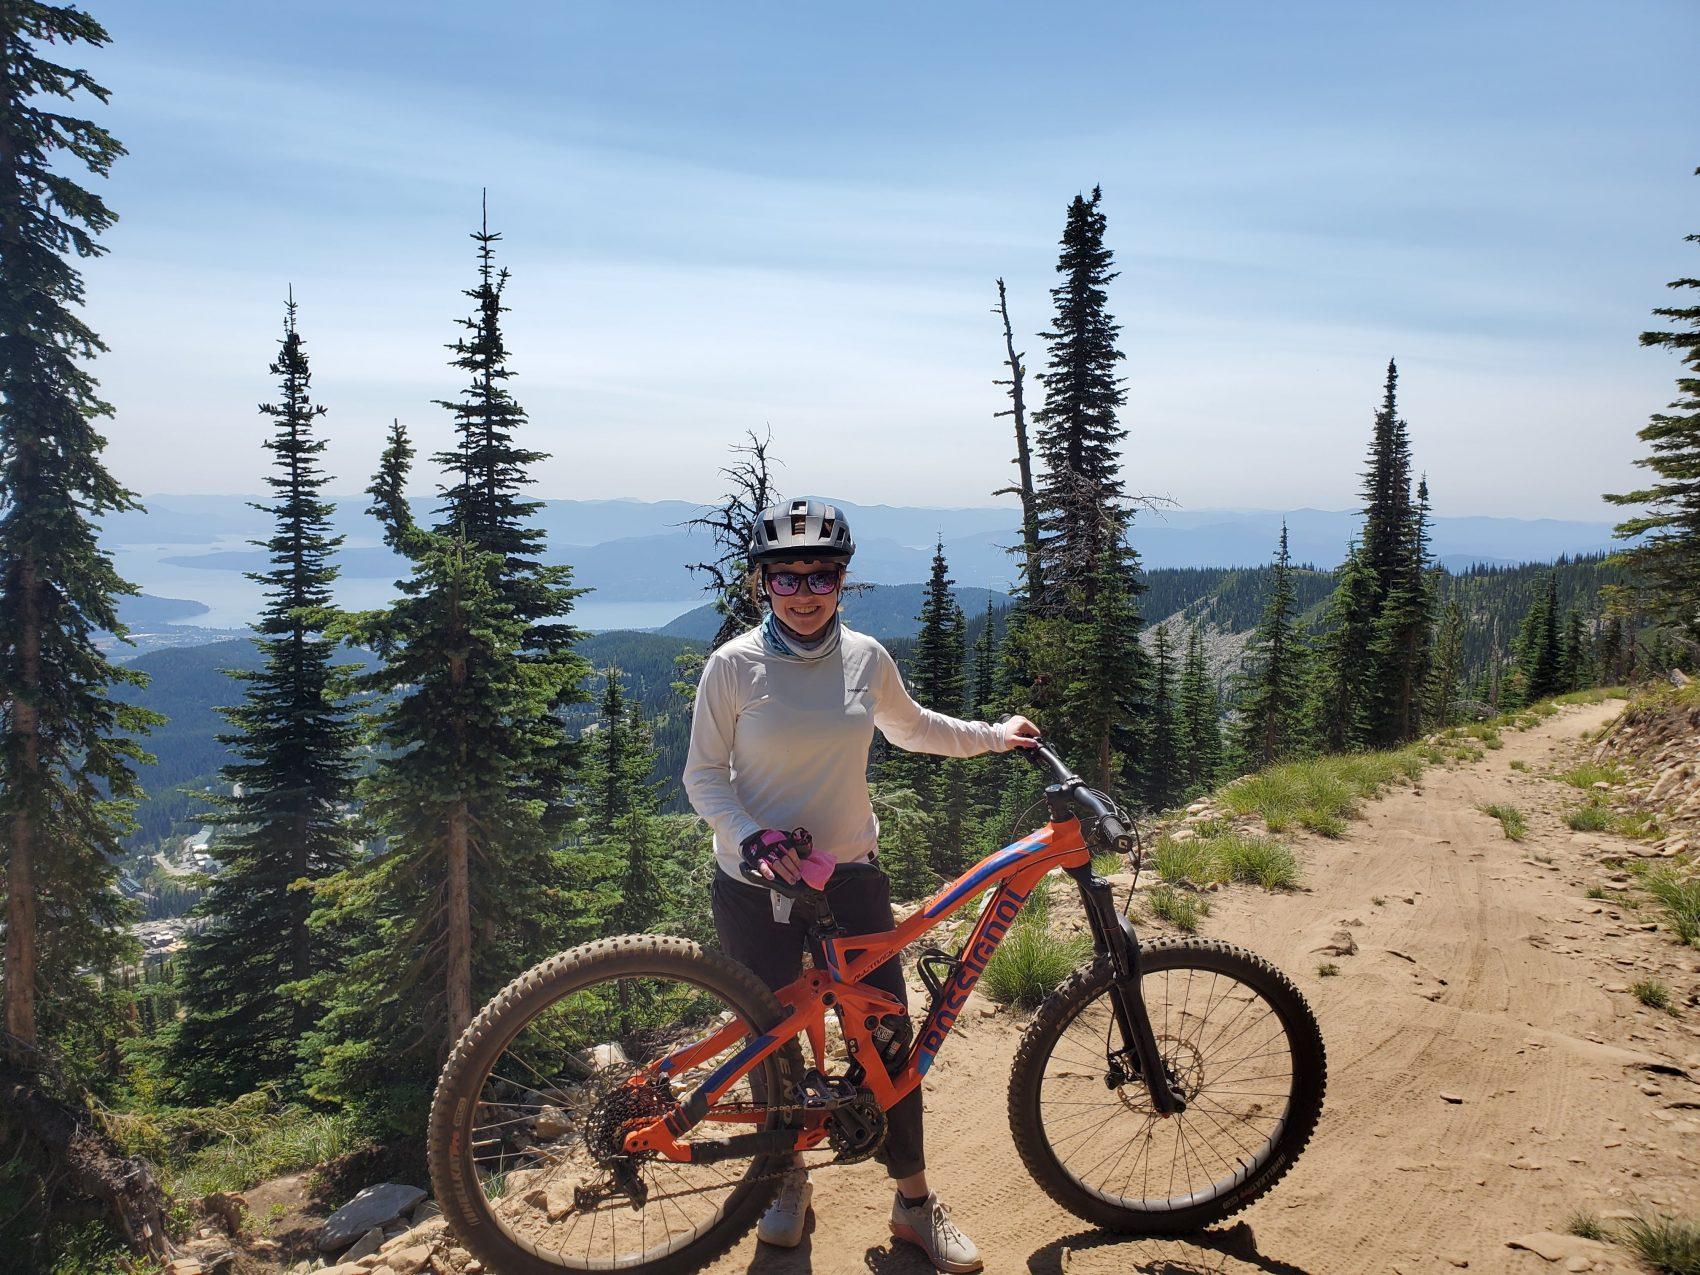 Girl with bike, schweitzer, Idaho